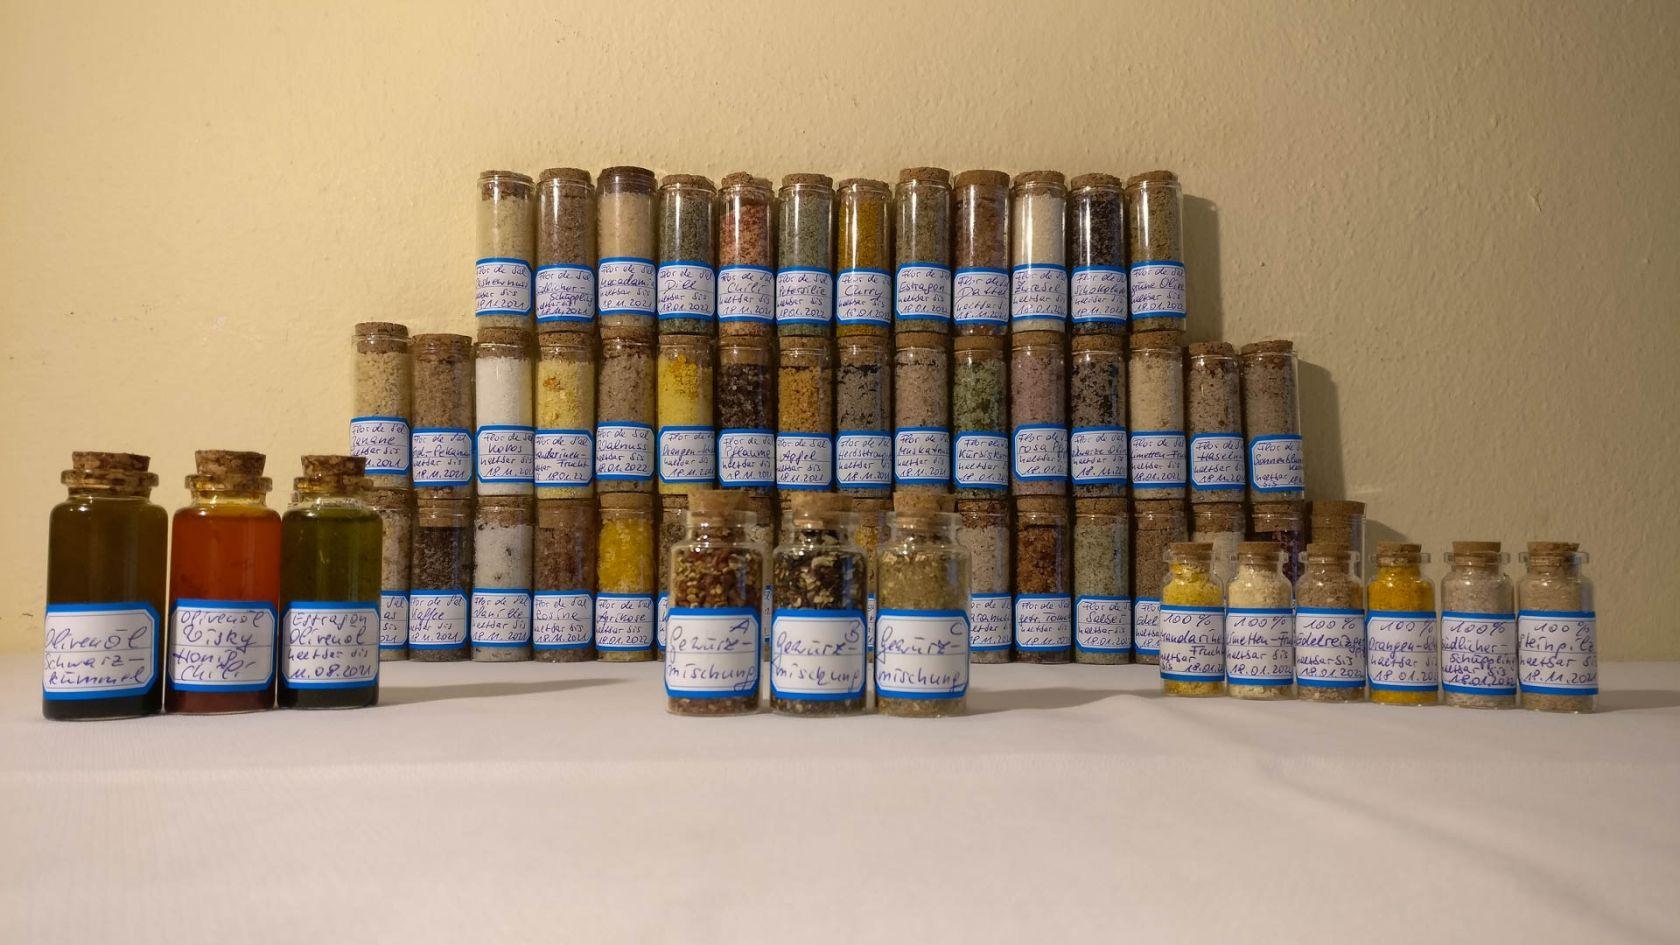 Flor de Sal with essences, Spice Mixes, French Dressing